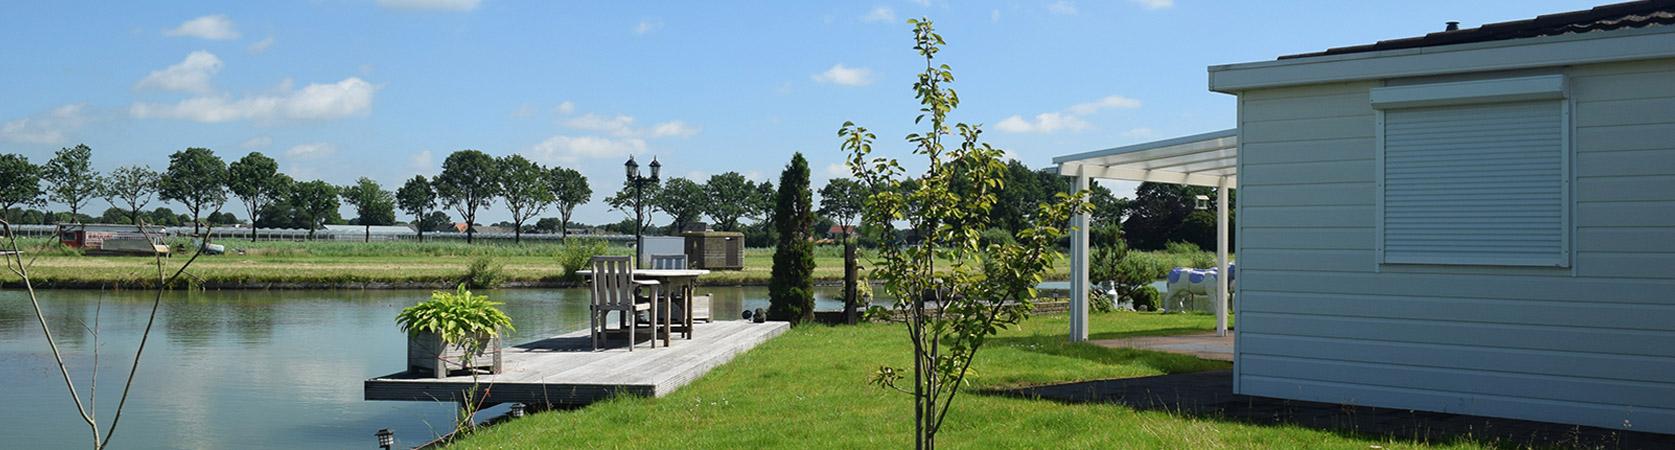 Park Brabantse Weelde